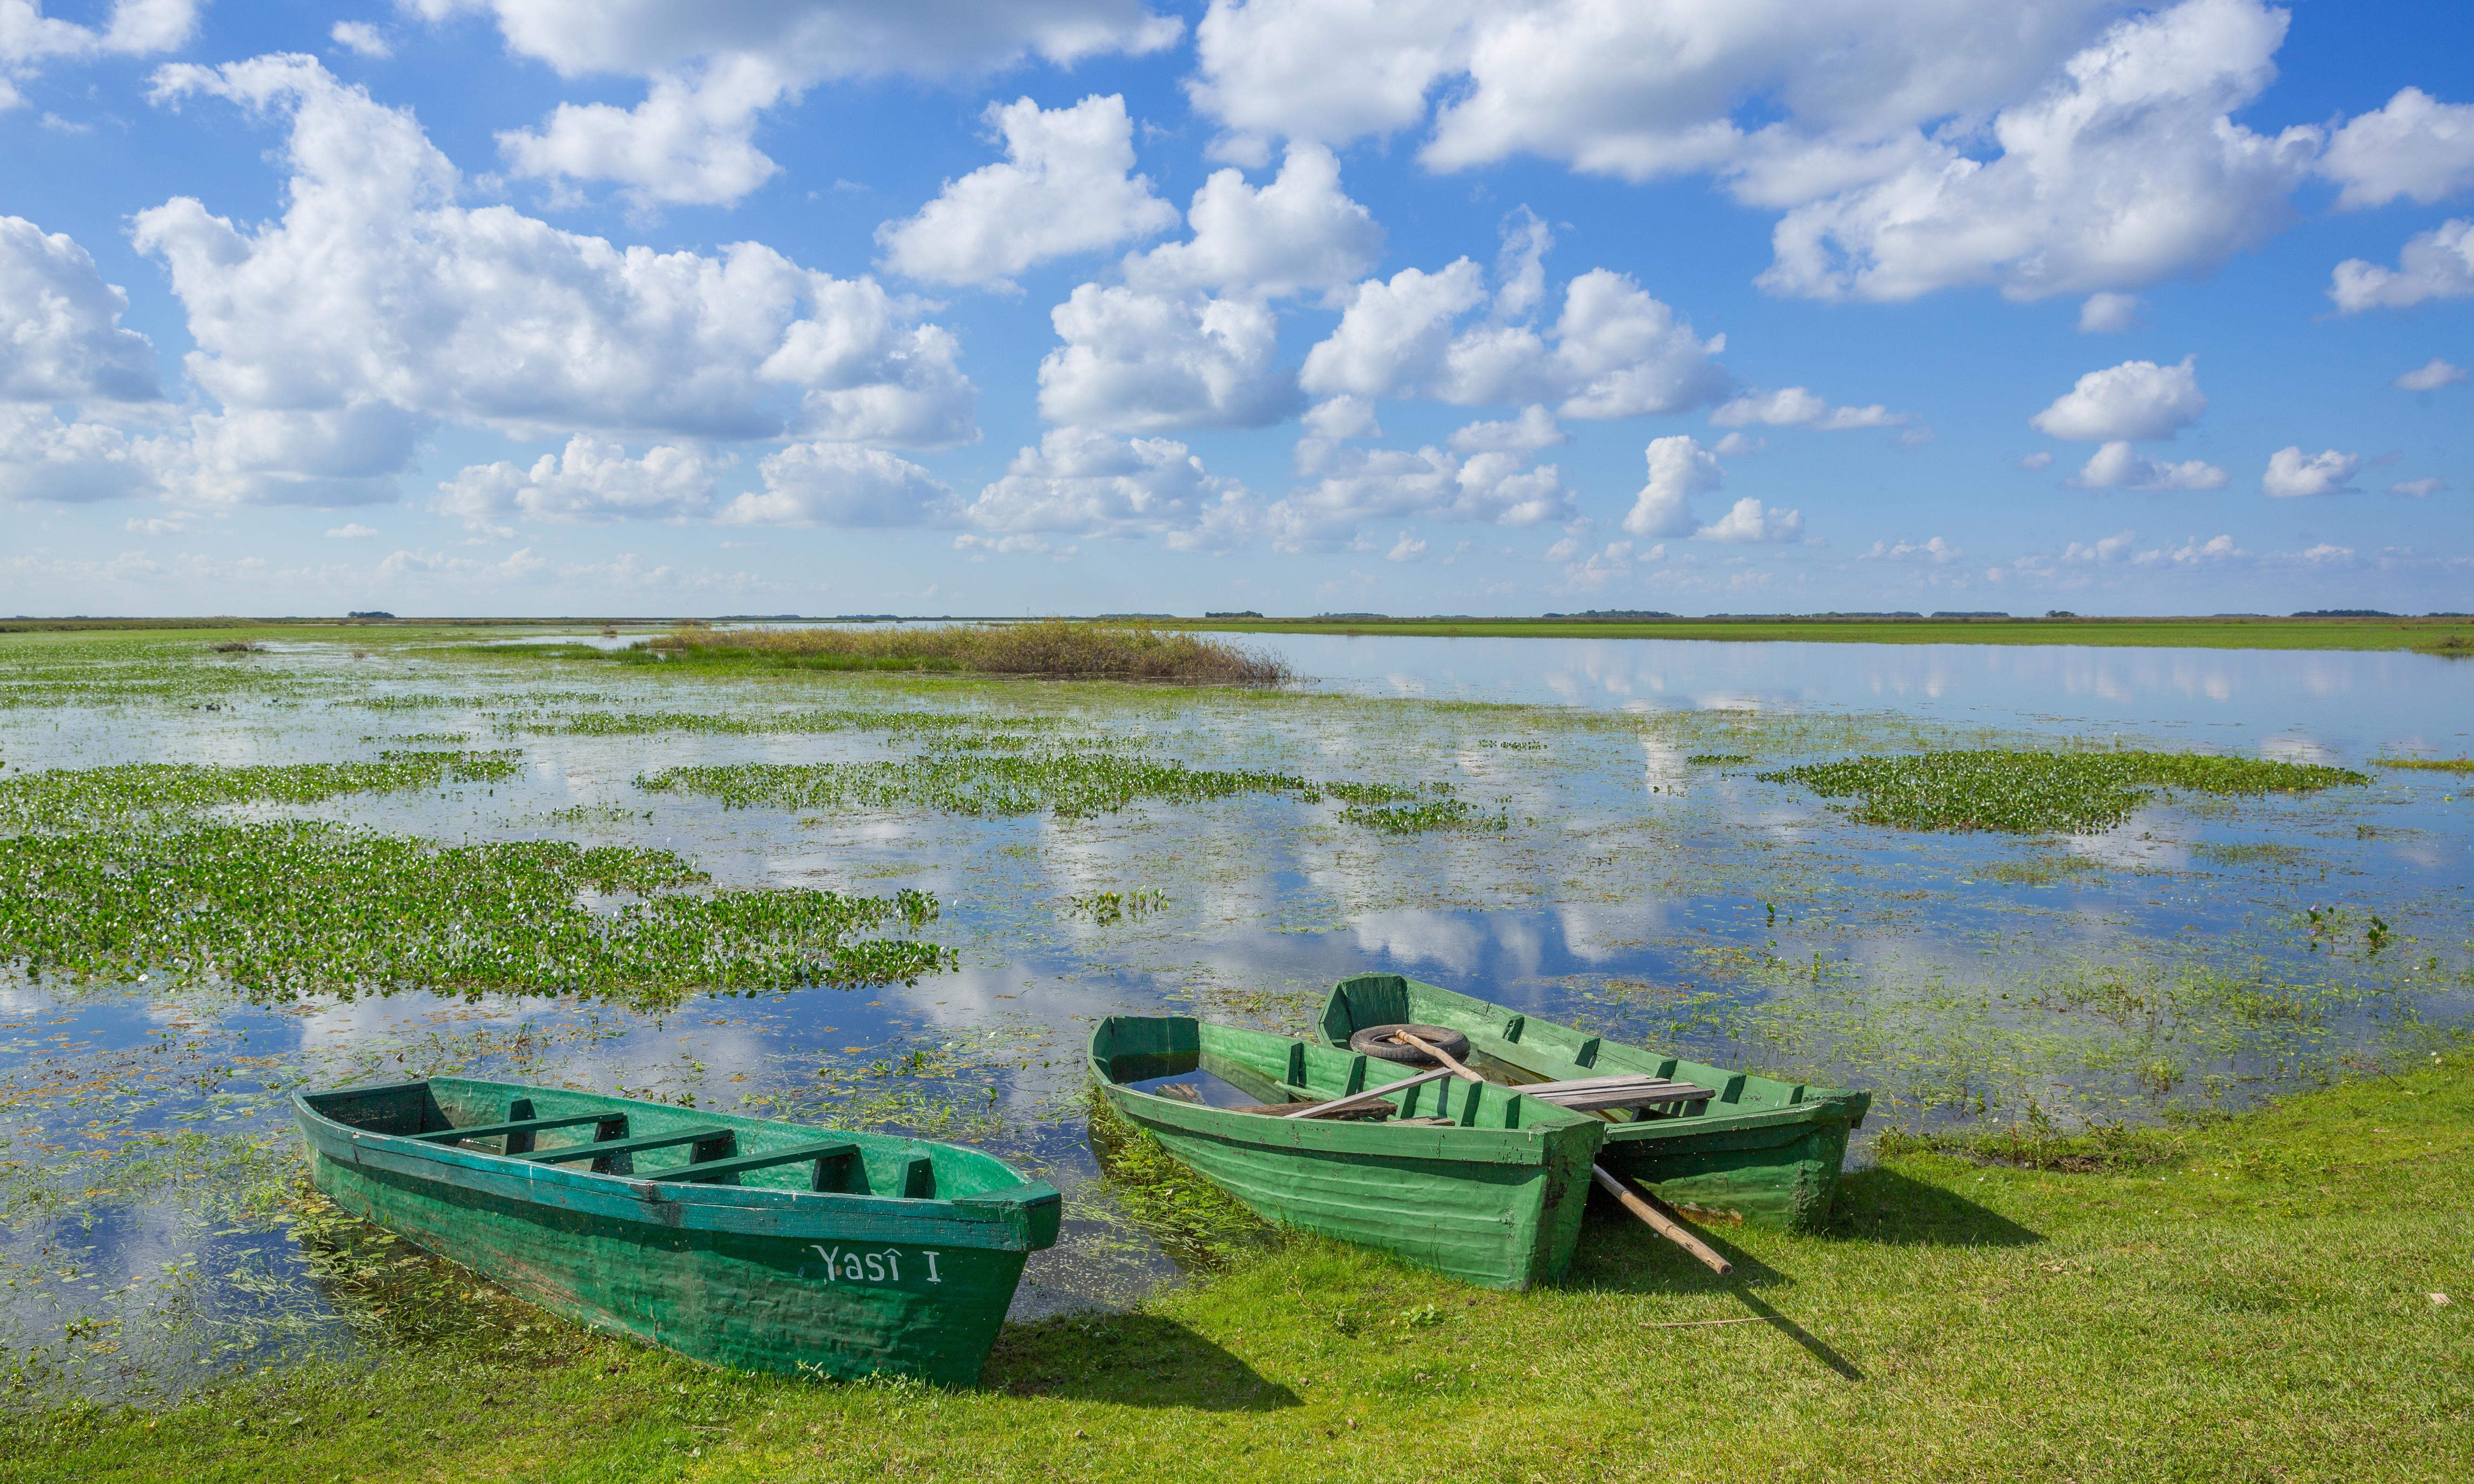 Call of the wild: eco adventures in Argentina's Iberá wetlands